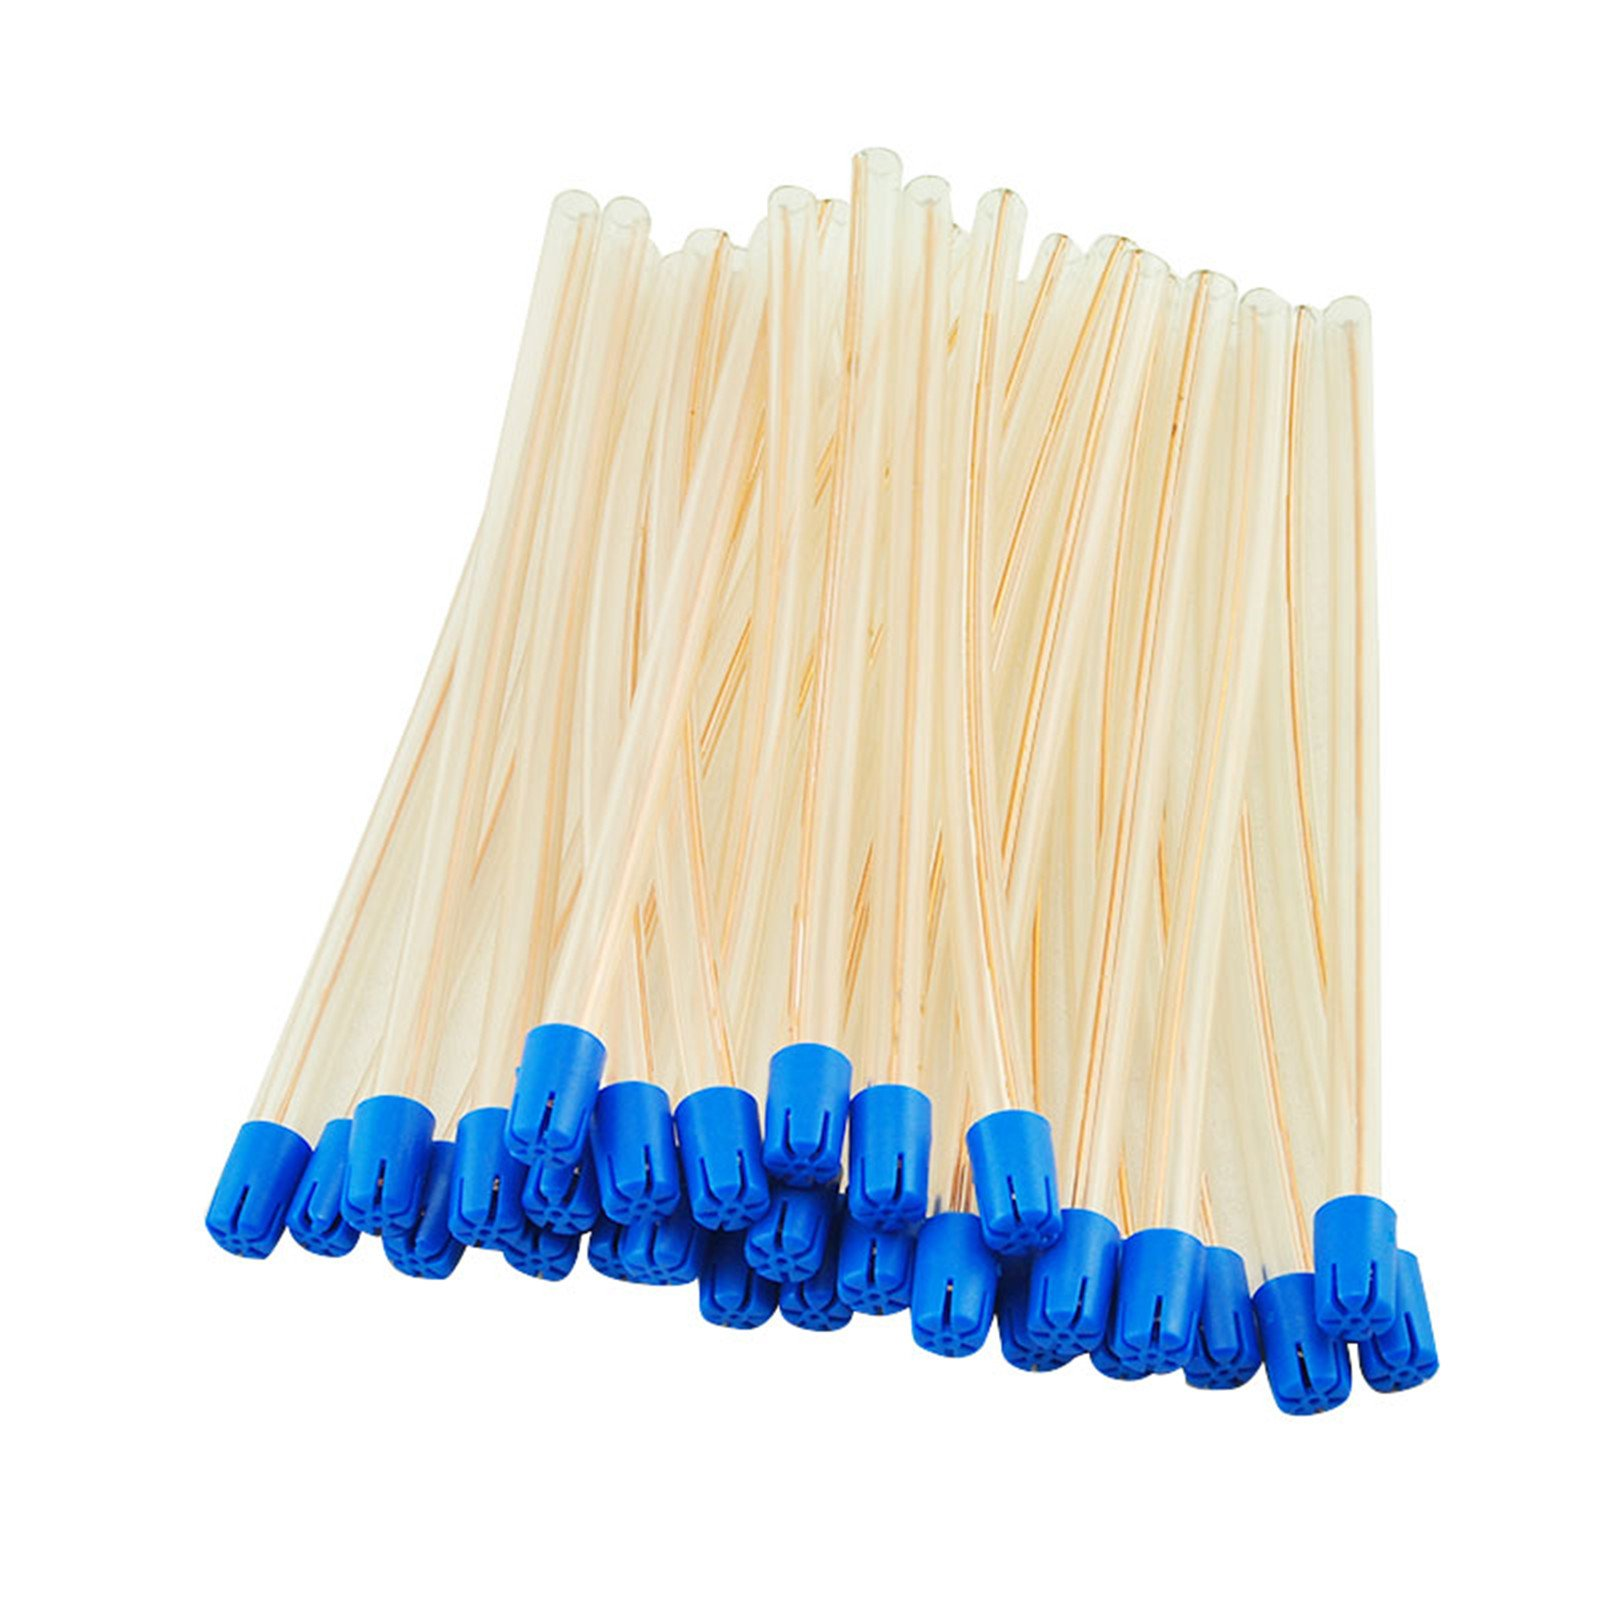 Denshine® 100pcs New Dental Disposable Saliva Ejector Low Volume Suction Aspirator Tube by Denshine (Image #2)